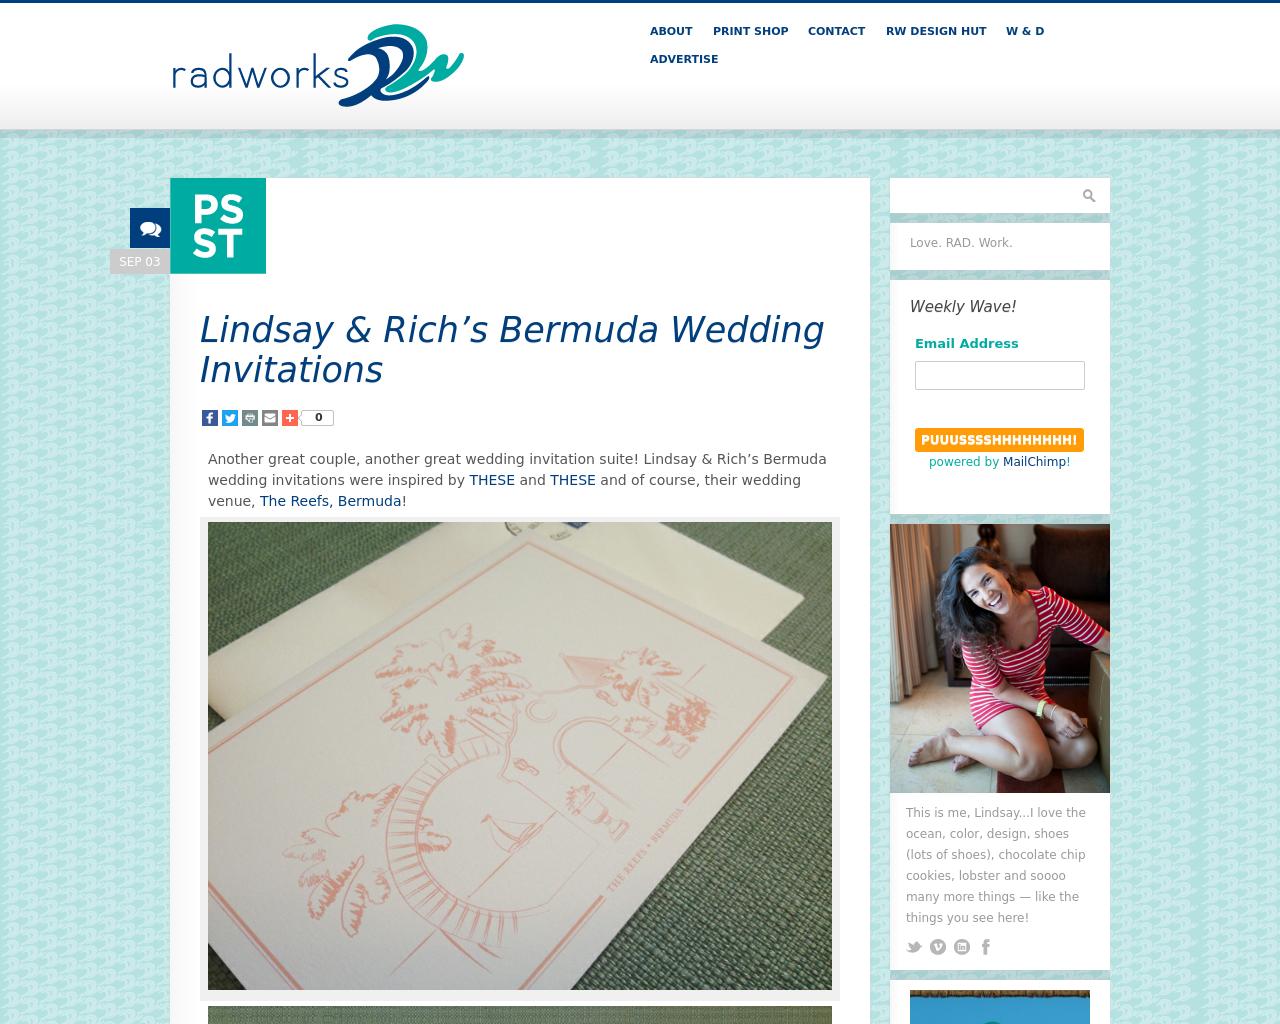 RadWorks-Advertising-Reviews-Pricing